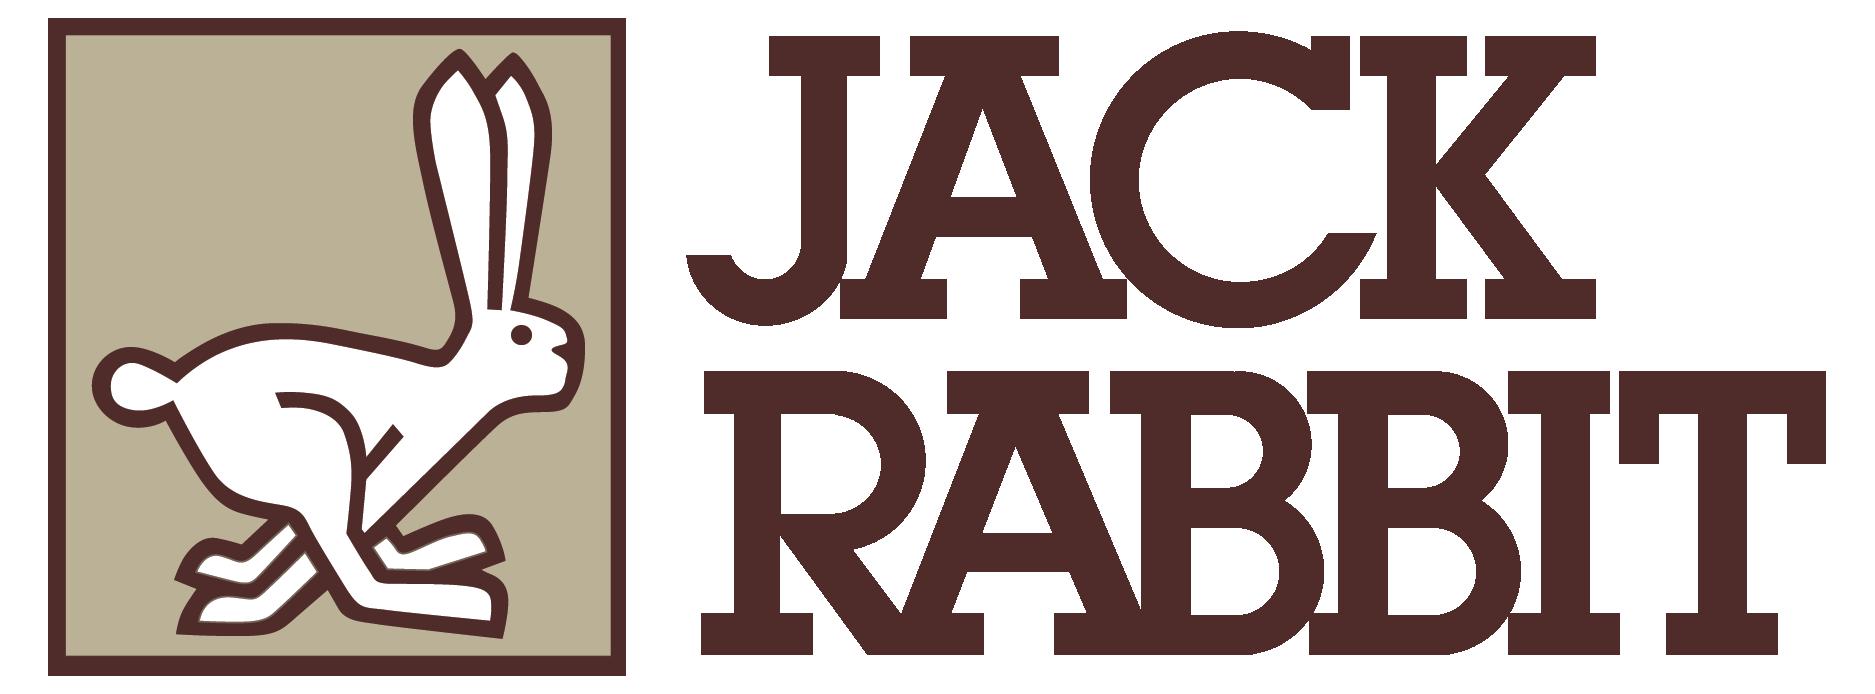 Clipart rabbit jack rabbit. Jackrabbit equipment harvest elevators